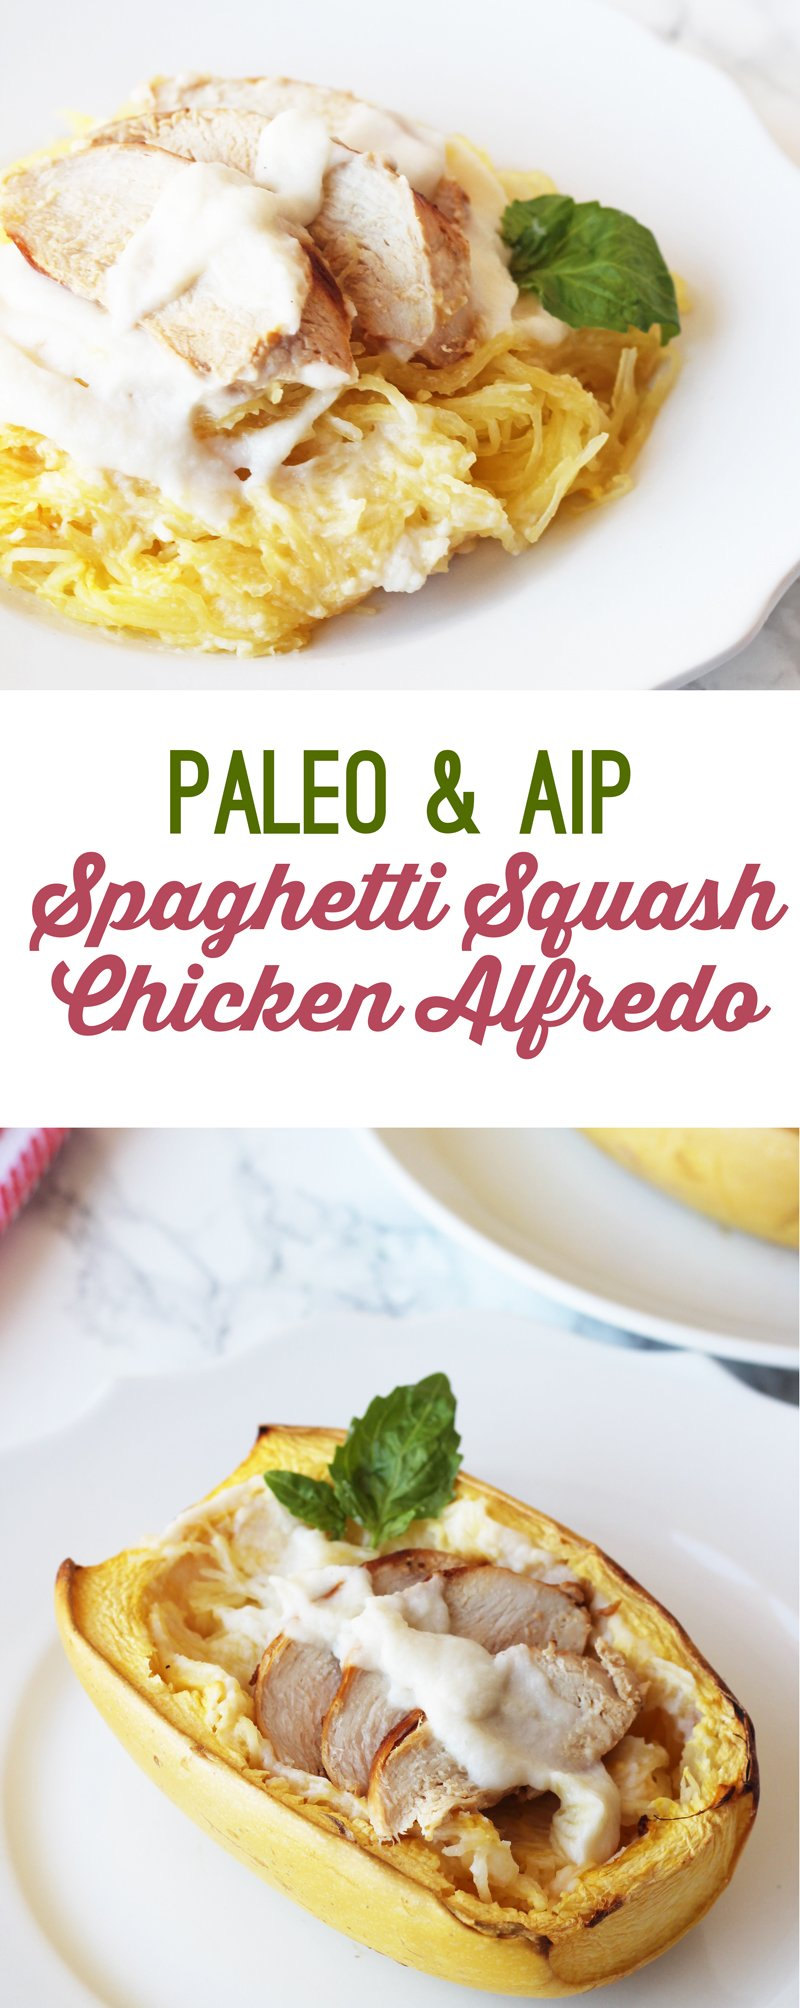 AIP Paleo Spaghetti Squash Chicken Alfredo (Dairy Free)